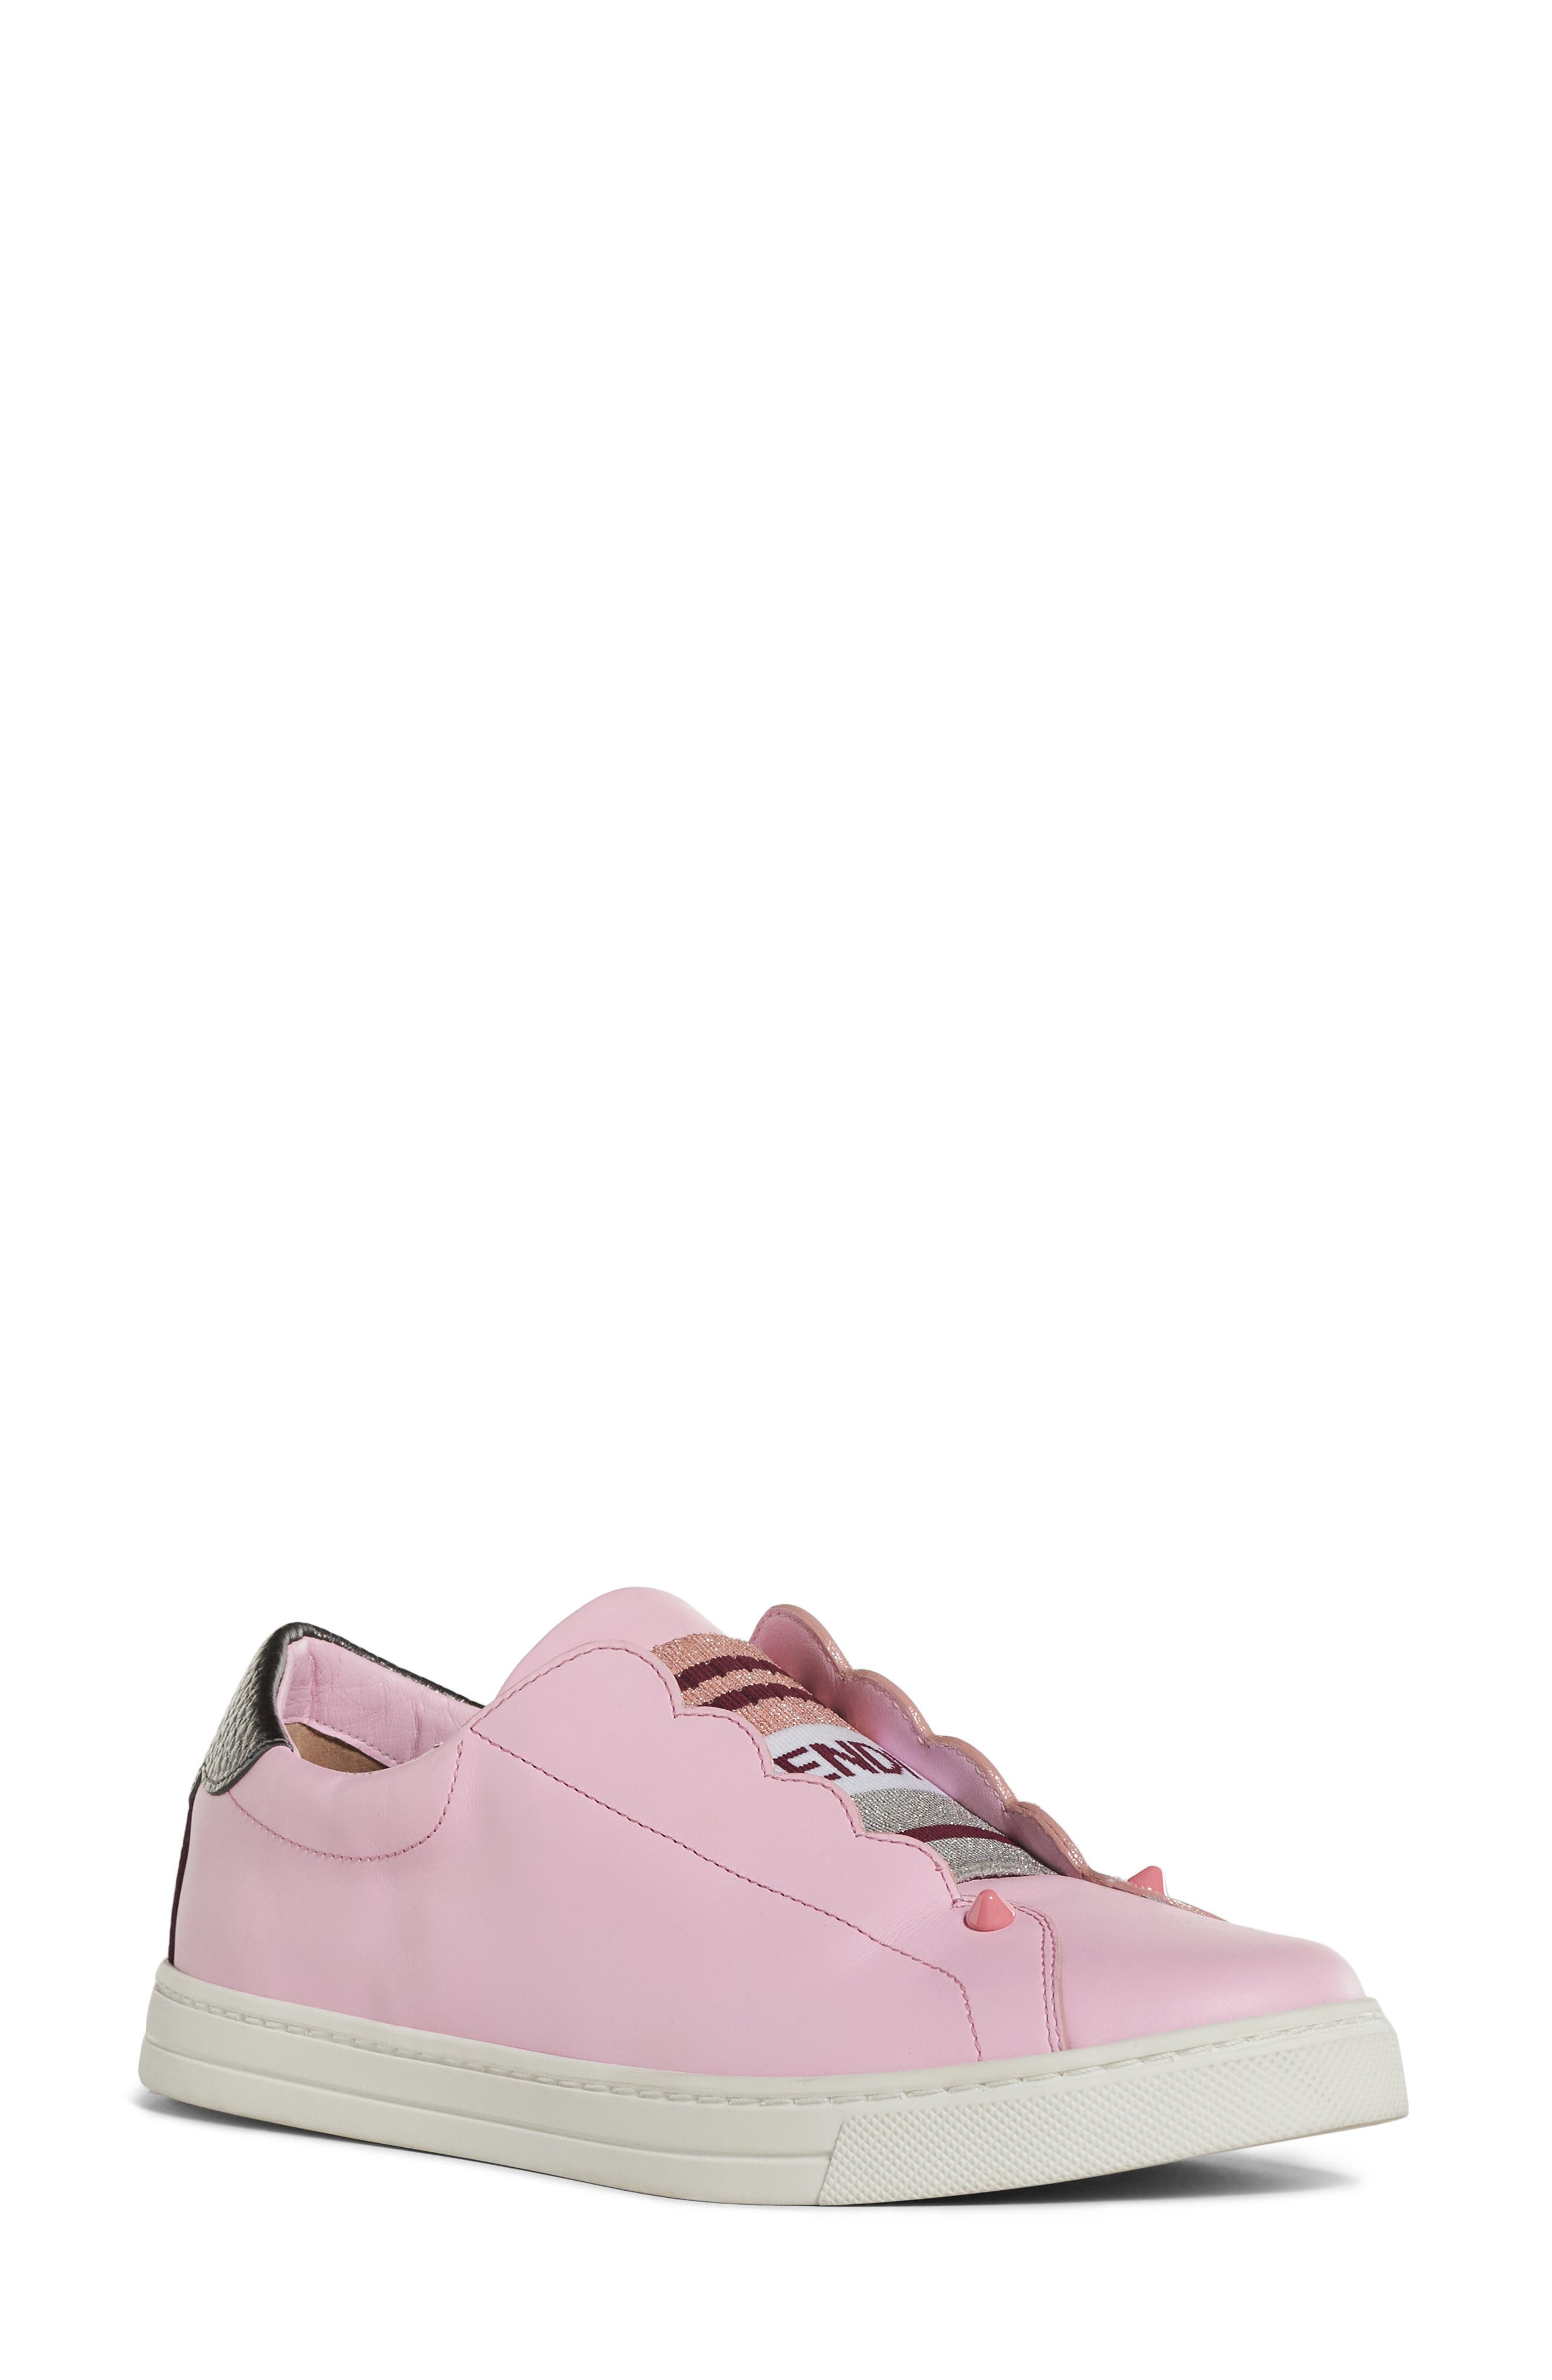 Rockoko Slip-On Sneaker,                             Main thumbnail 1, color,                             650